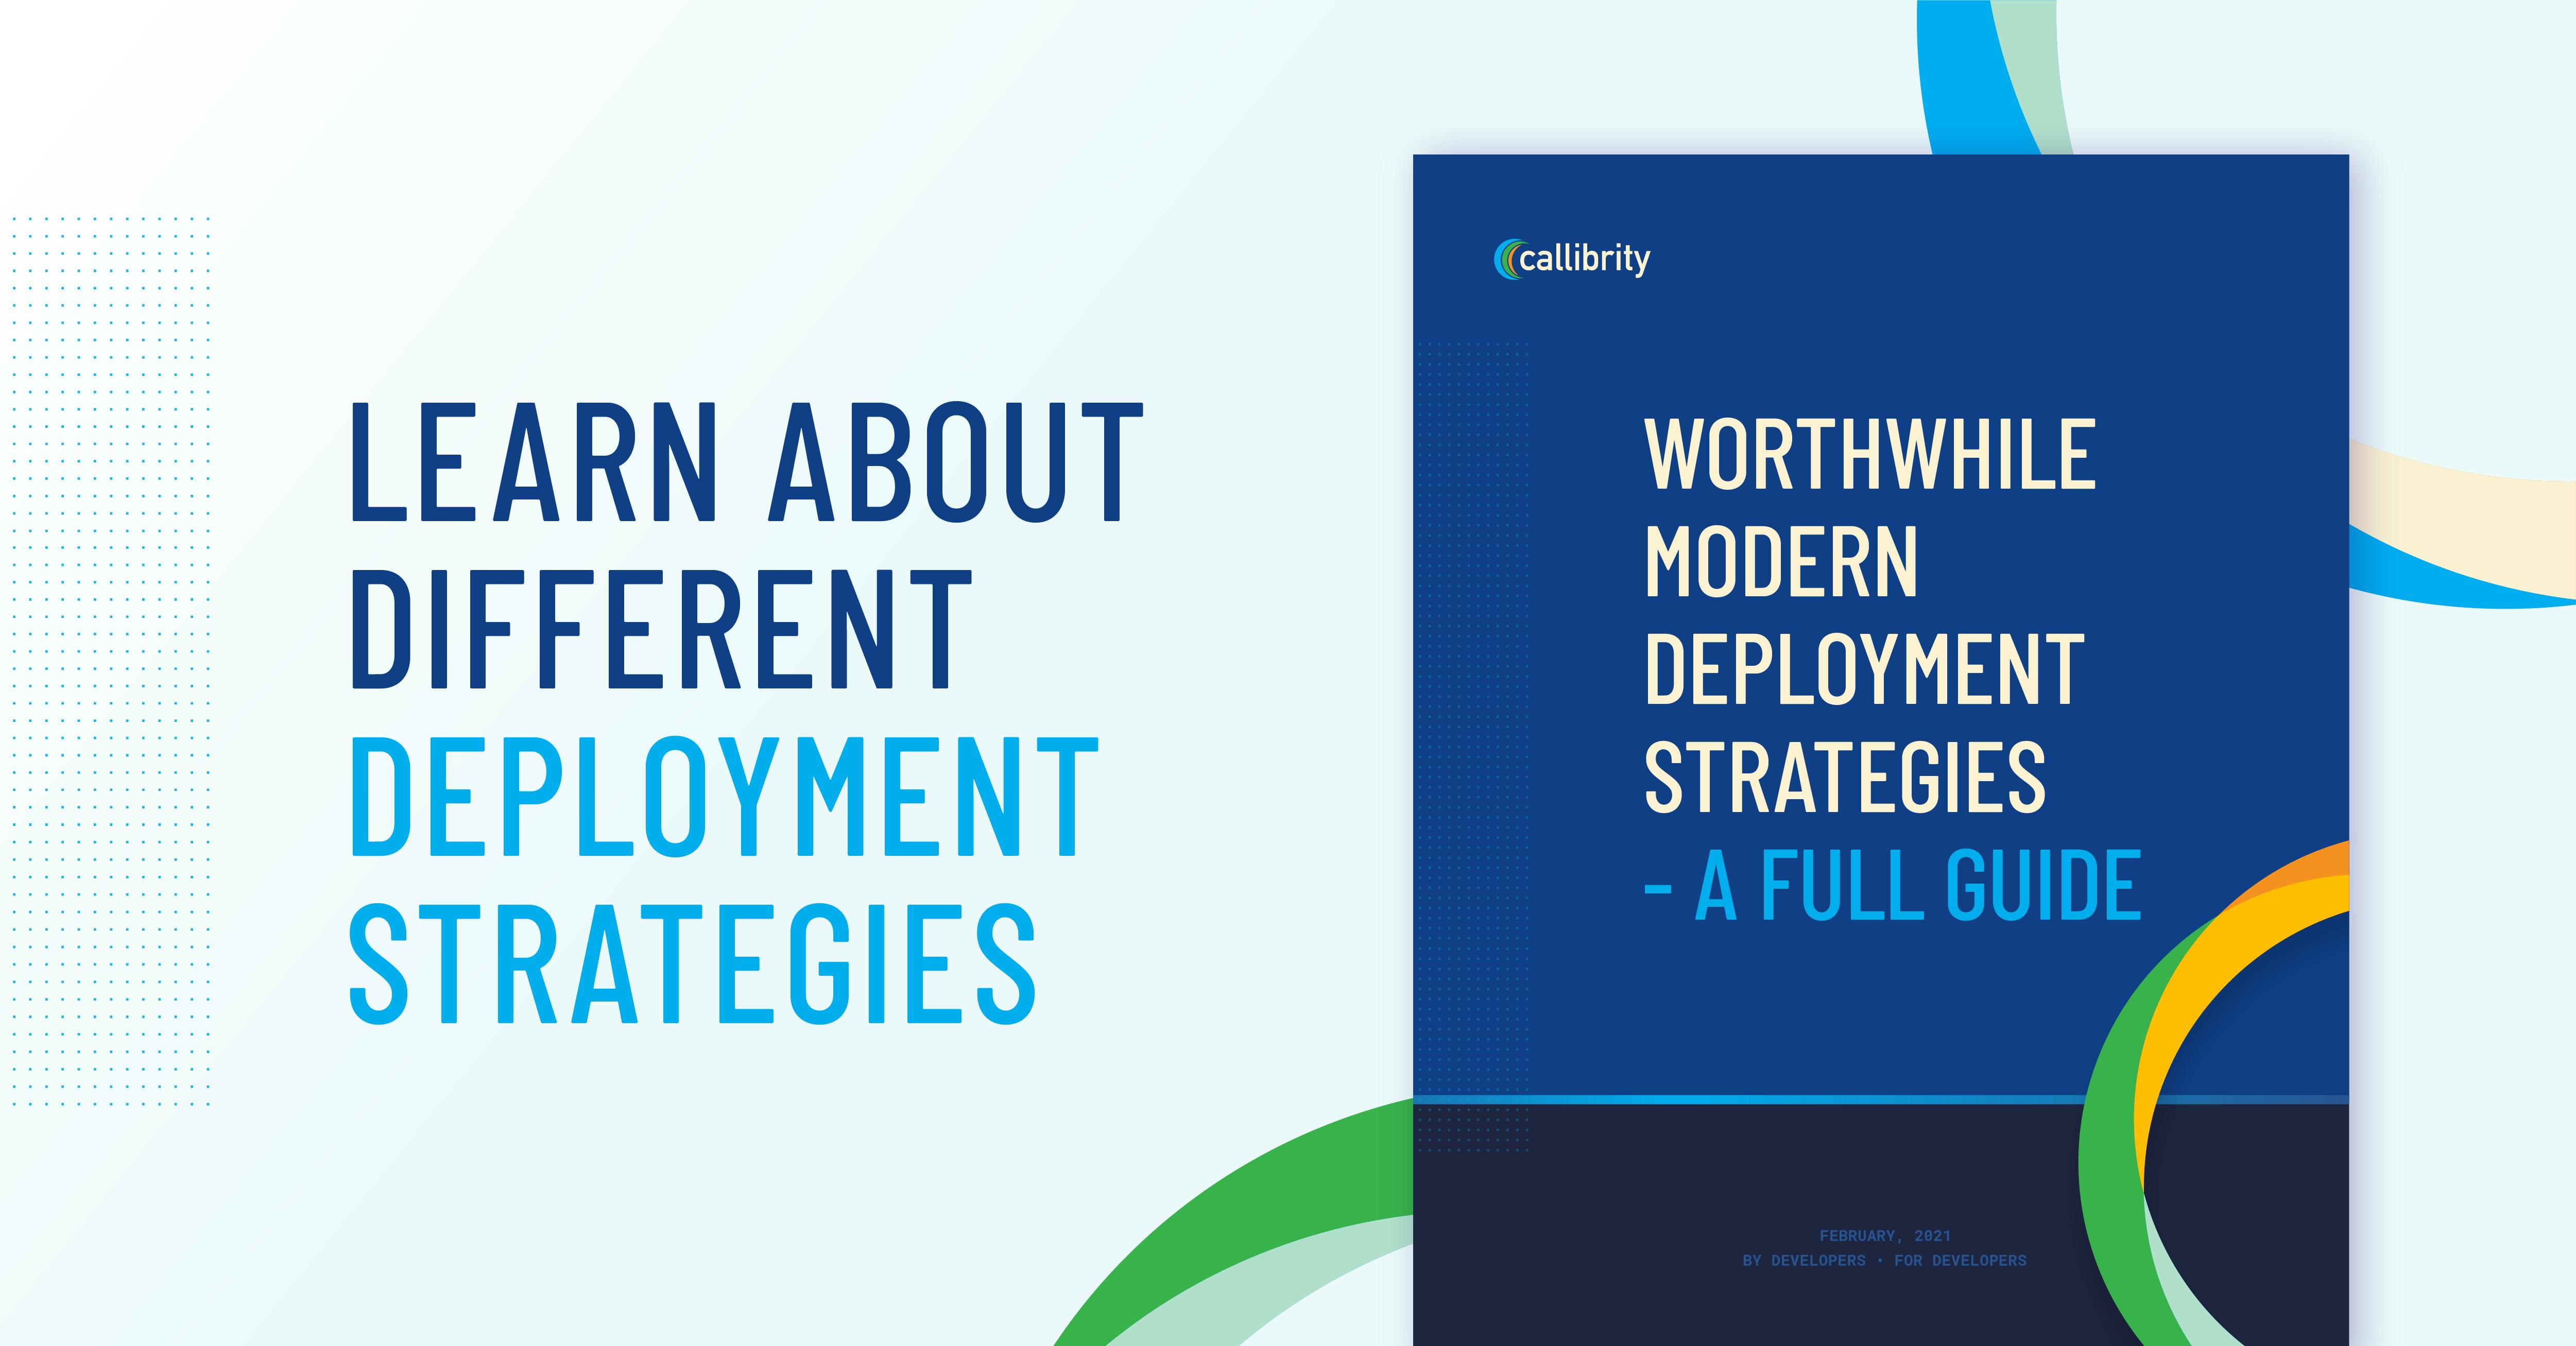 Worthwhile Modern Deployment Strategies